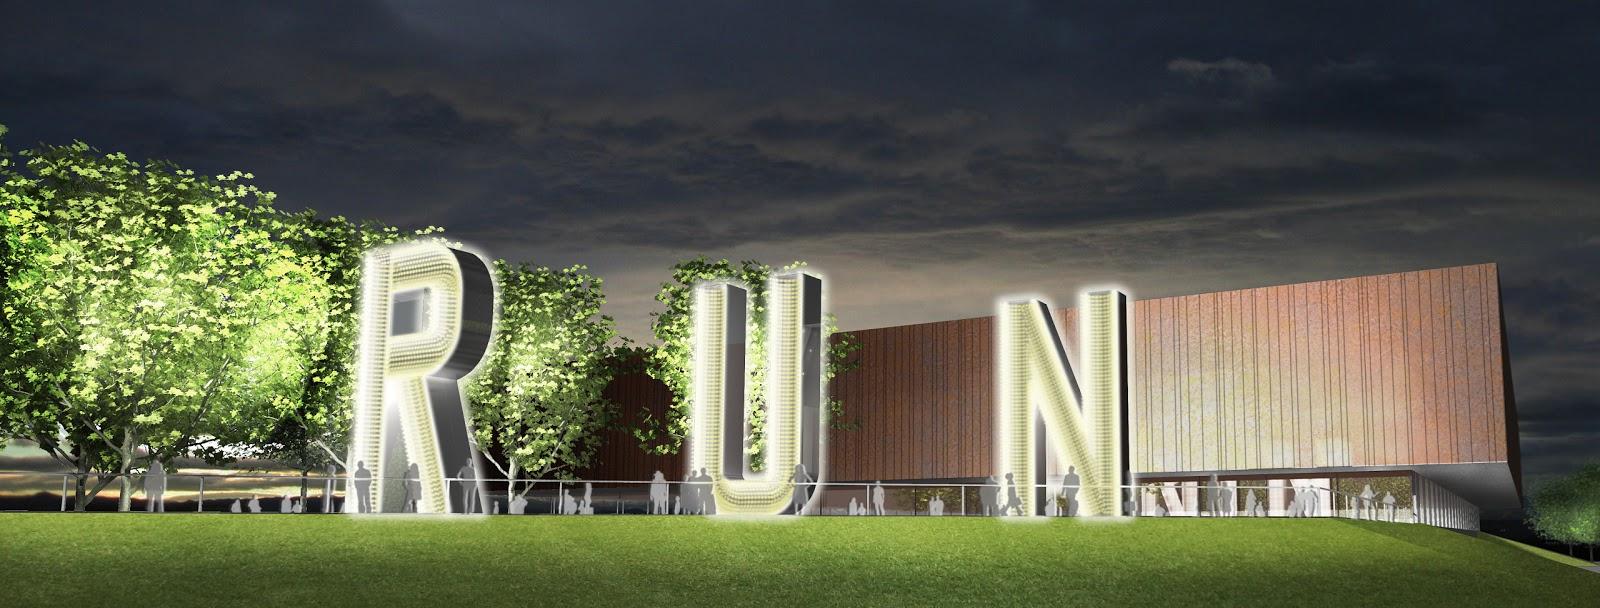 Public Art Network: Olympic Art Commissions Take Shape